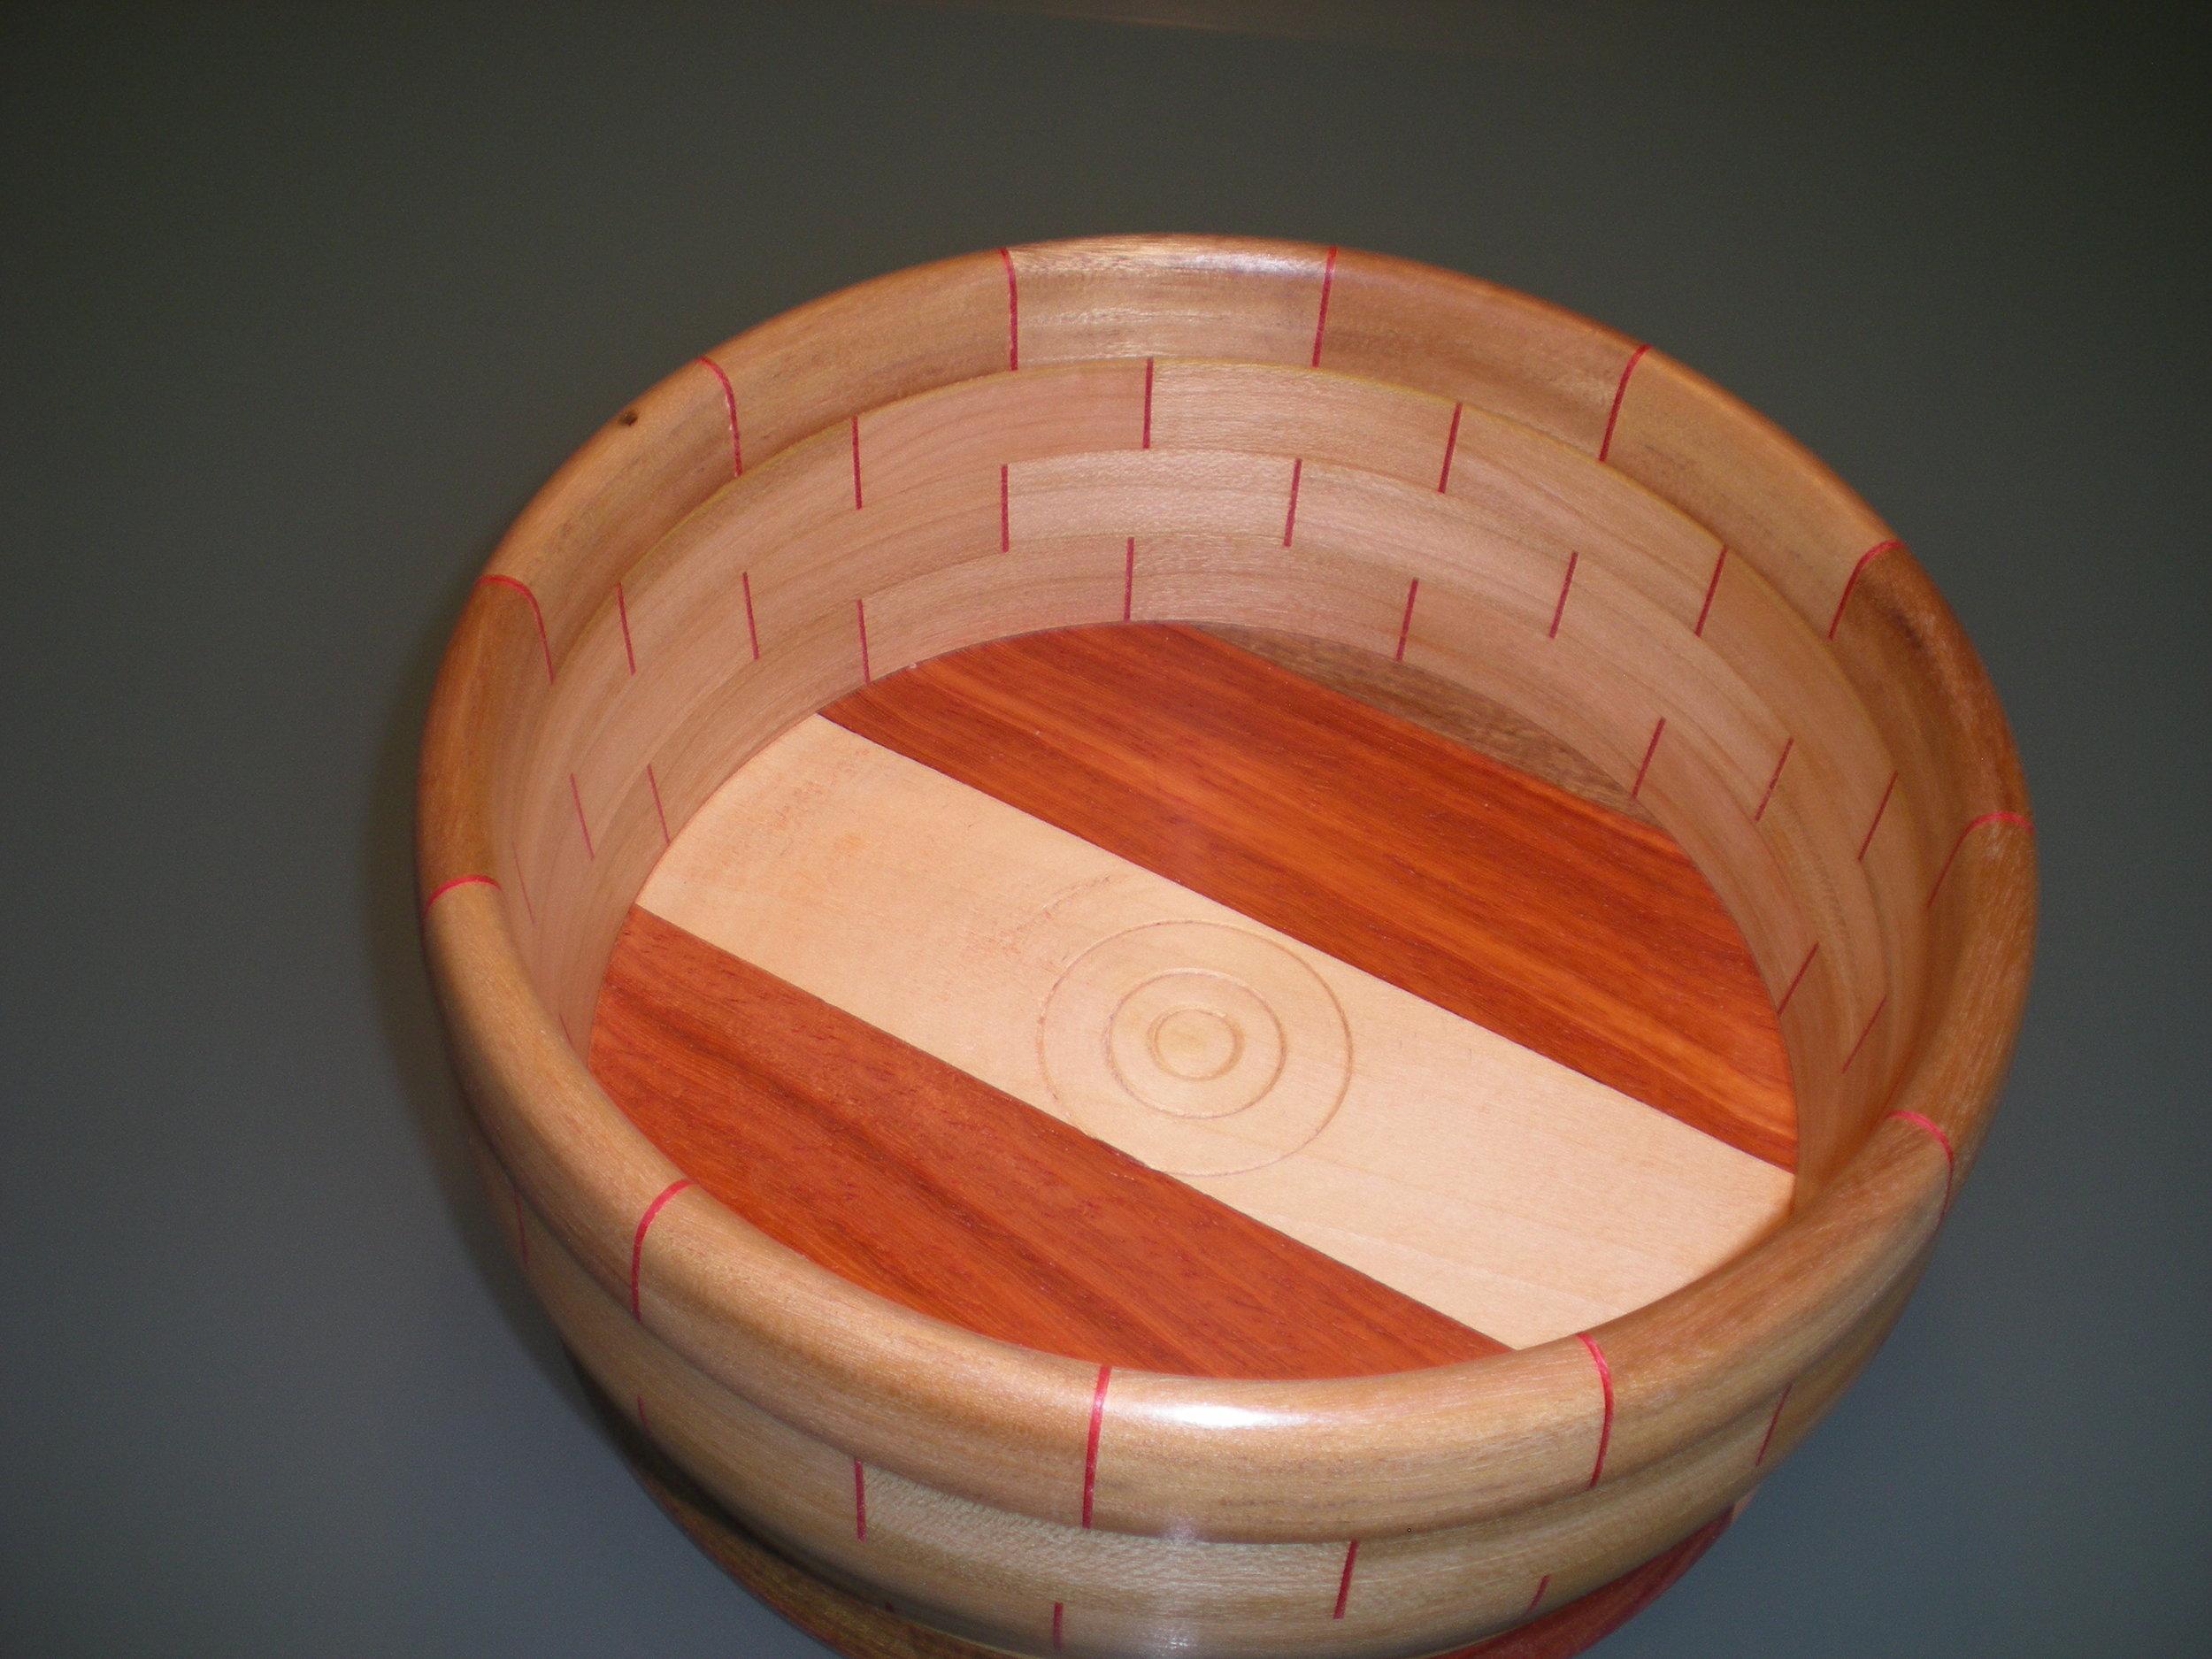 RJC Wood Creations - Bowls (42).JPG